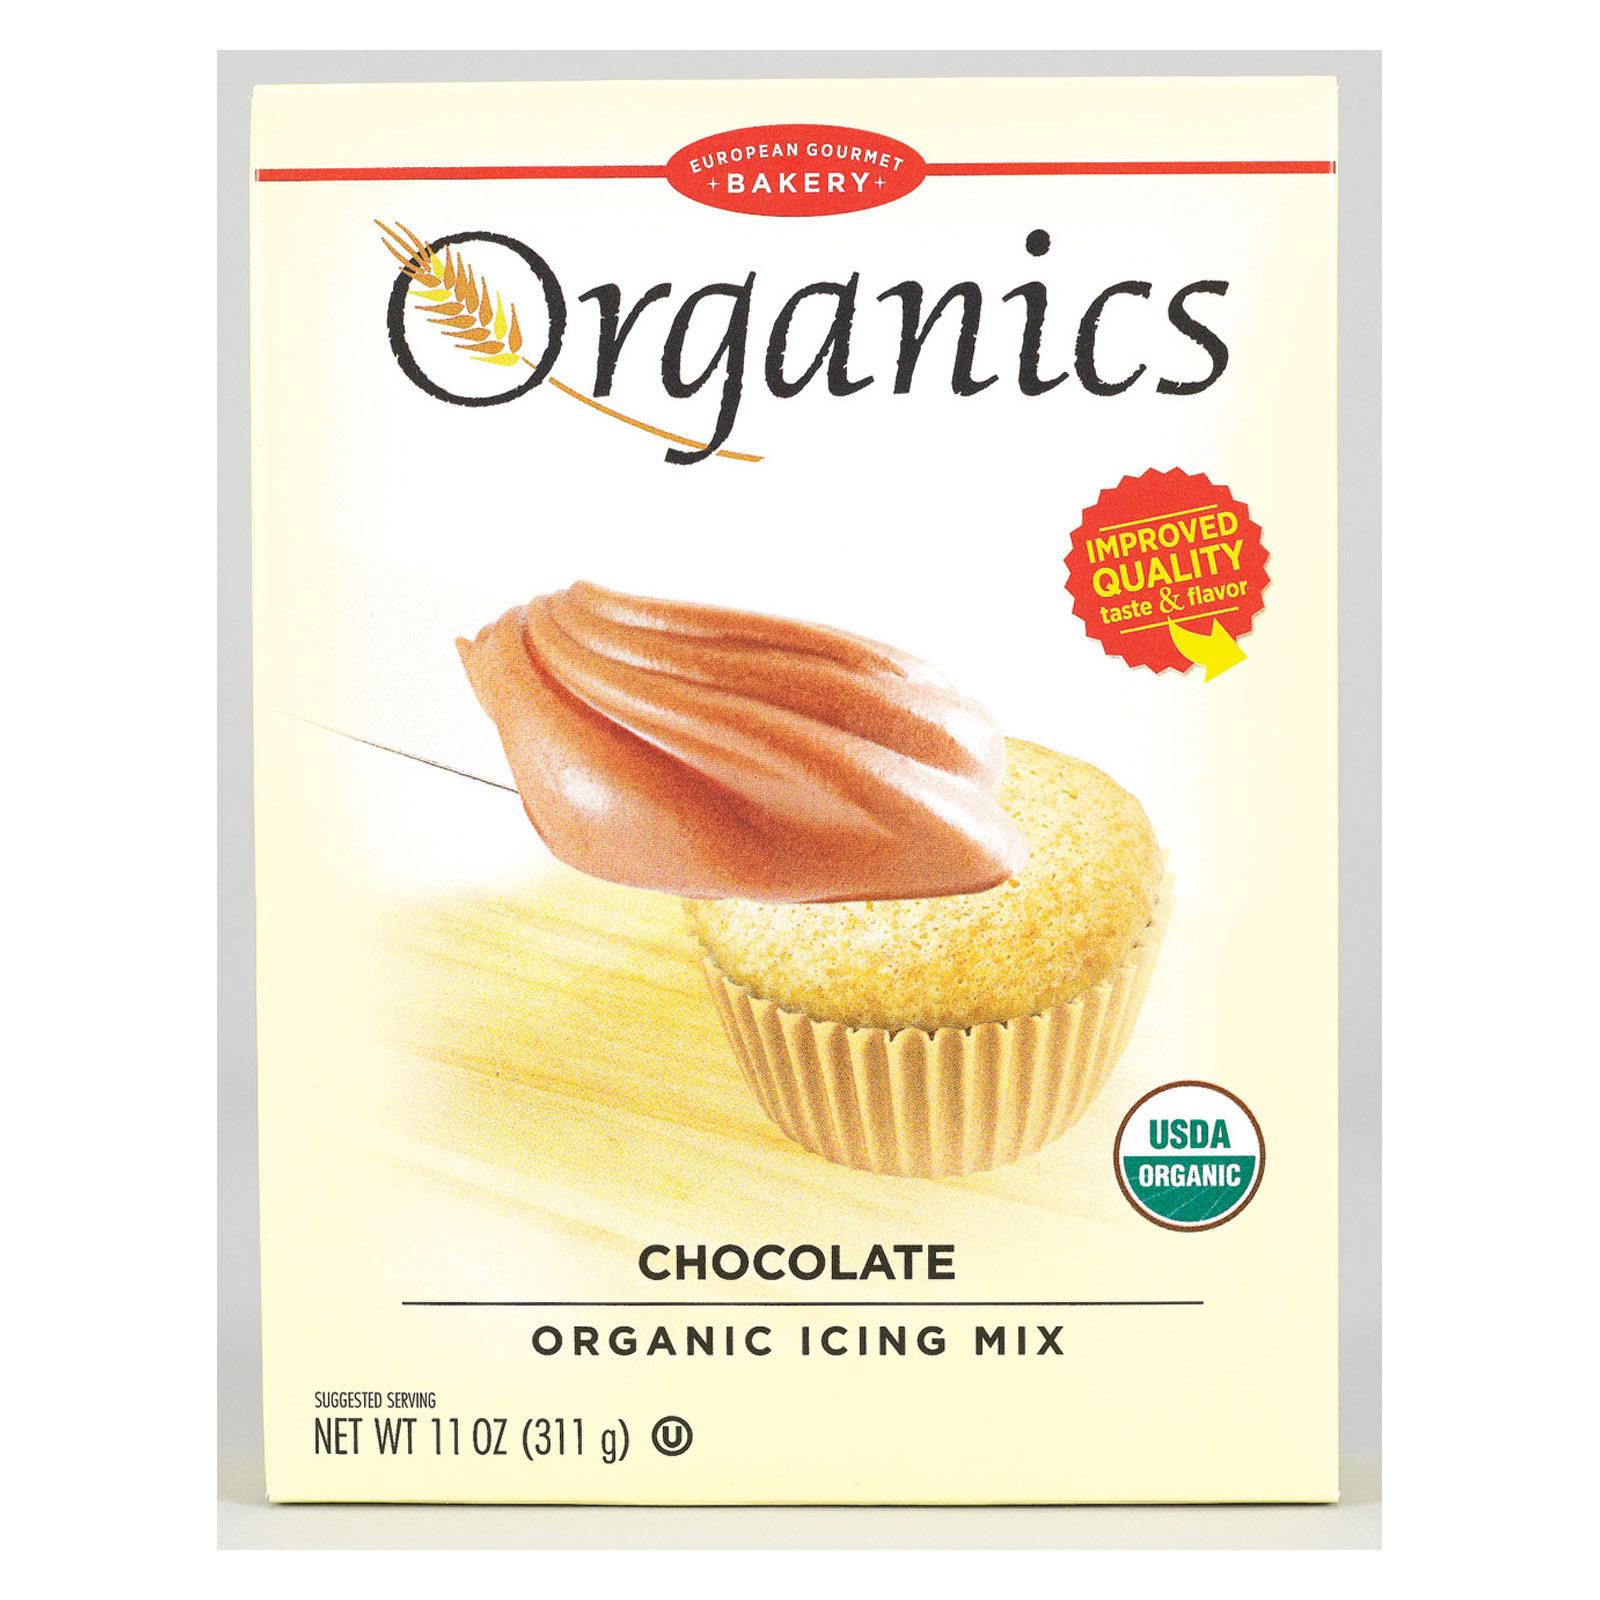 European Gourmet Bakery Organic Chocolate Icing Mix - Chocolate Icing - Case of 12 - 11 oz.